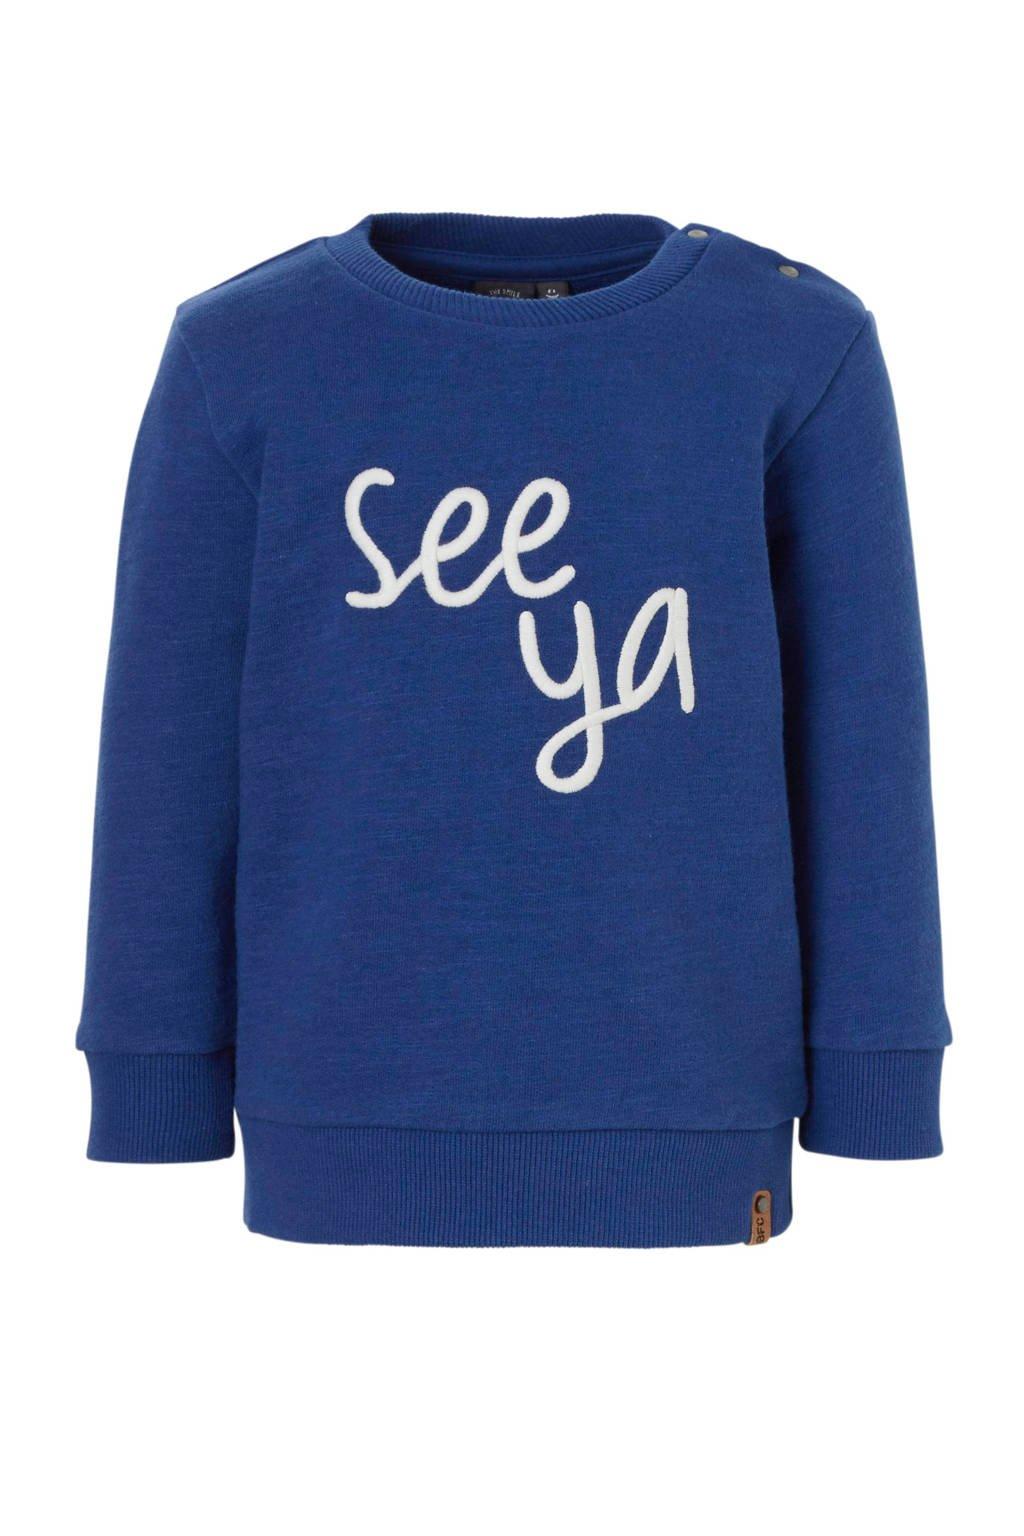 Babyface sweater met tekst blauw, Kobaltblauw